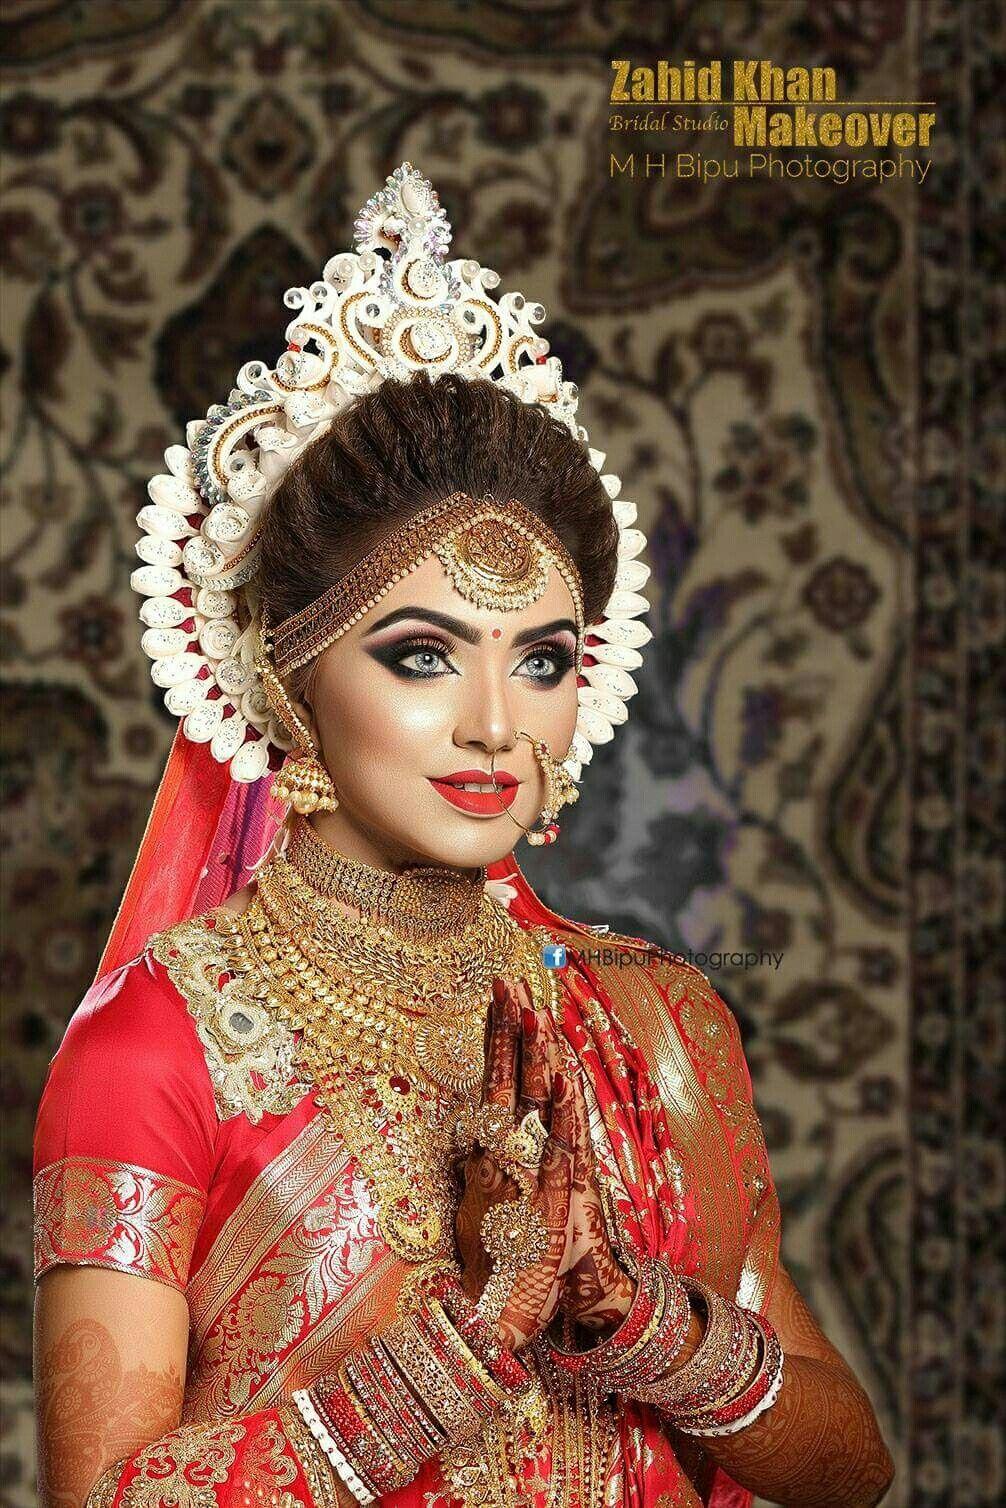 Pin by Sukhpreet Kaur🌹💗💟💞🌹 on Bride   Pinterest   India ...